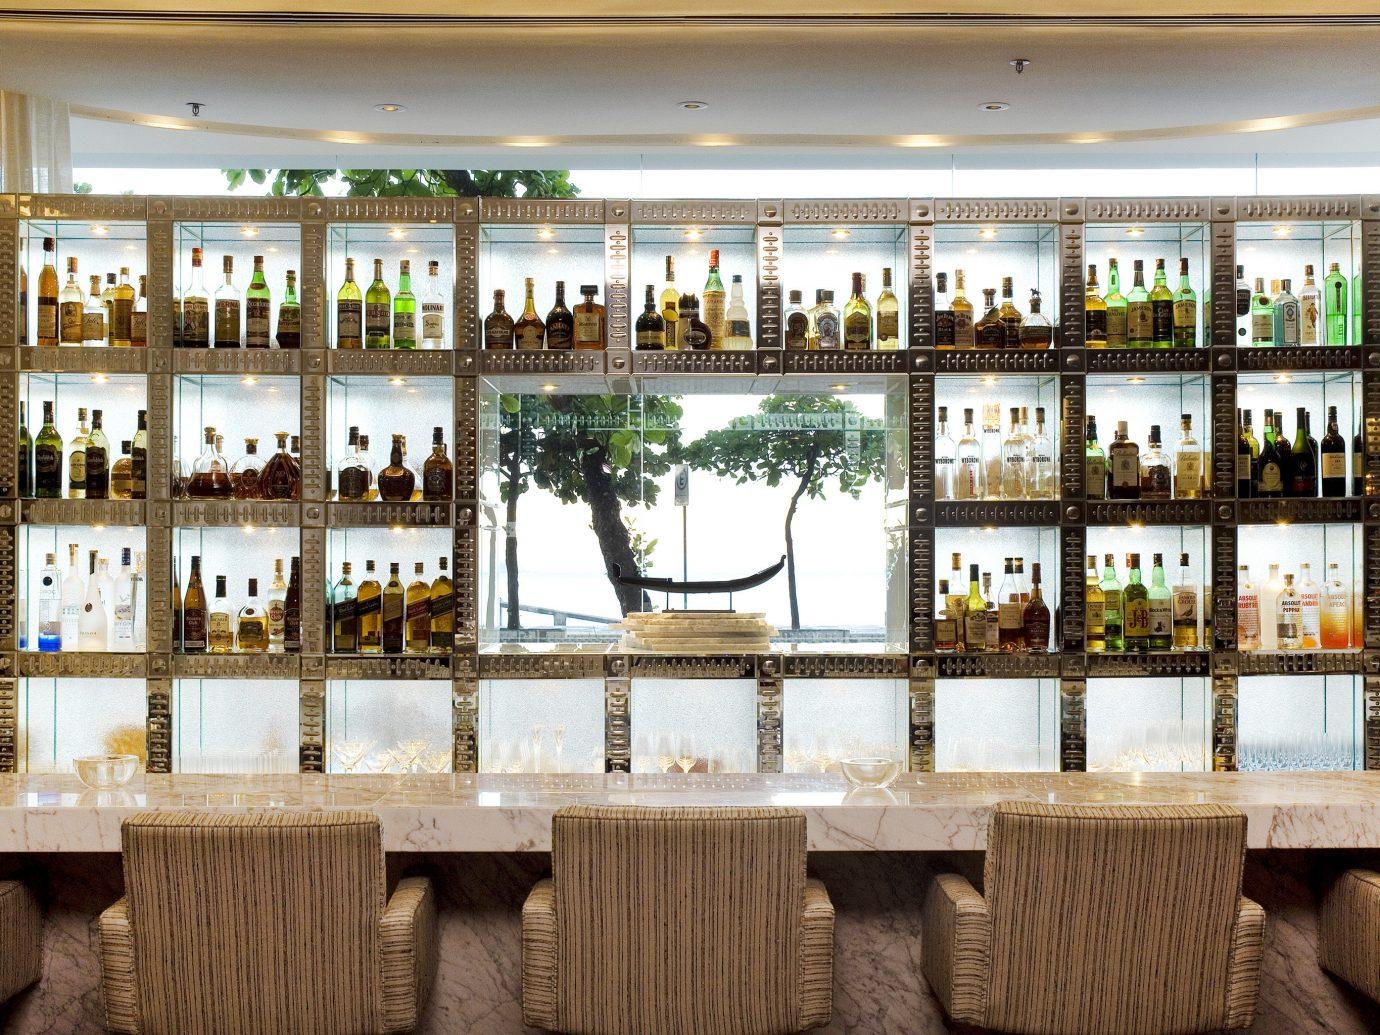 Bar Dining Drink Eat Hip Hotels Modern Romance indoor restaurant interior design estate retail window covering window